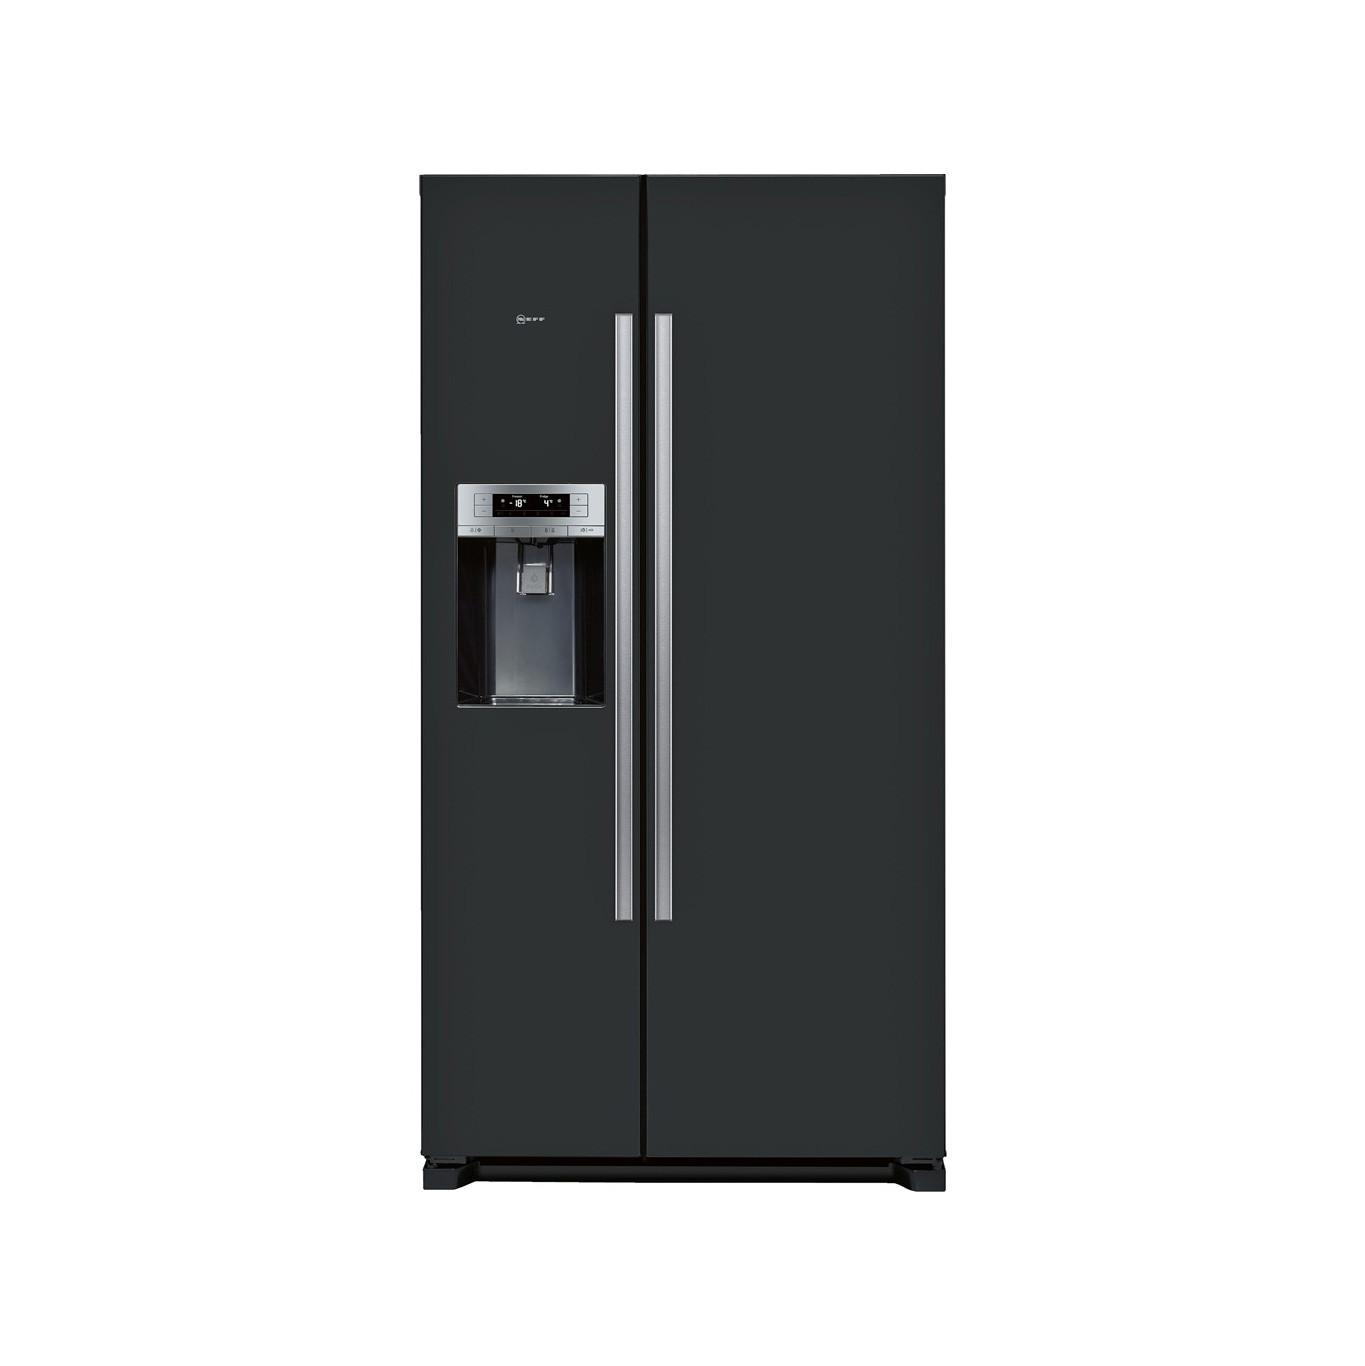 Neff N50 Black American Style Fridge Freezer KA3902B20G